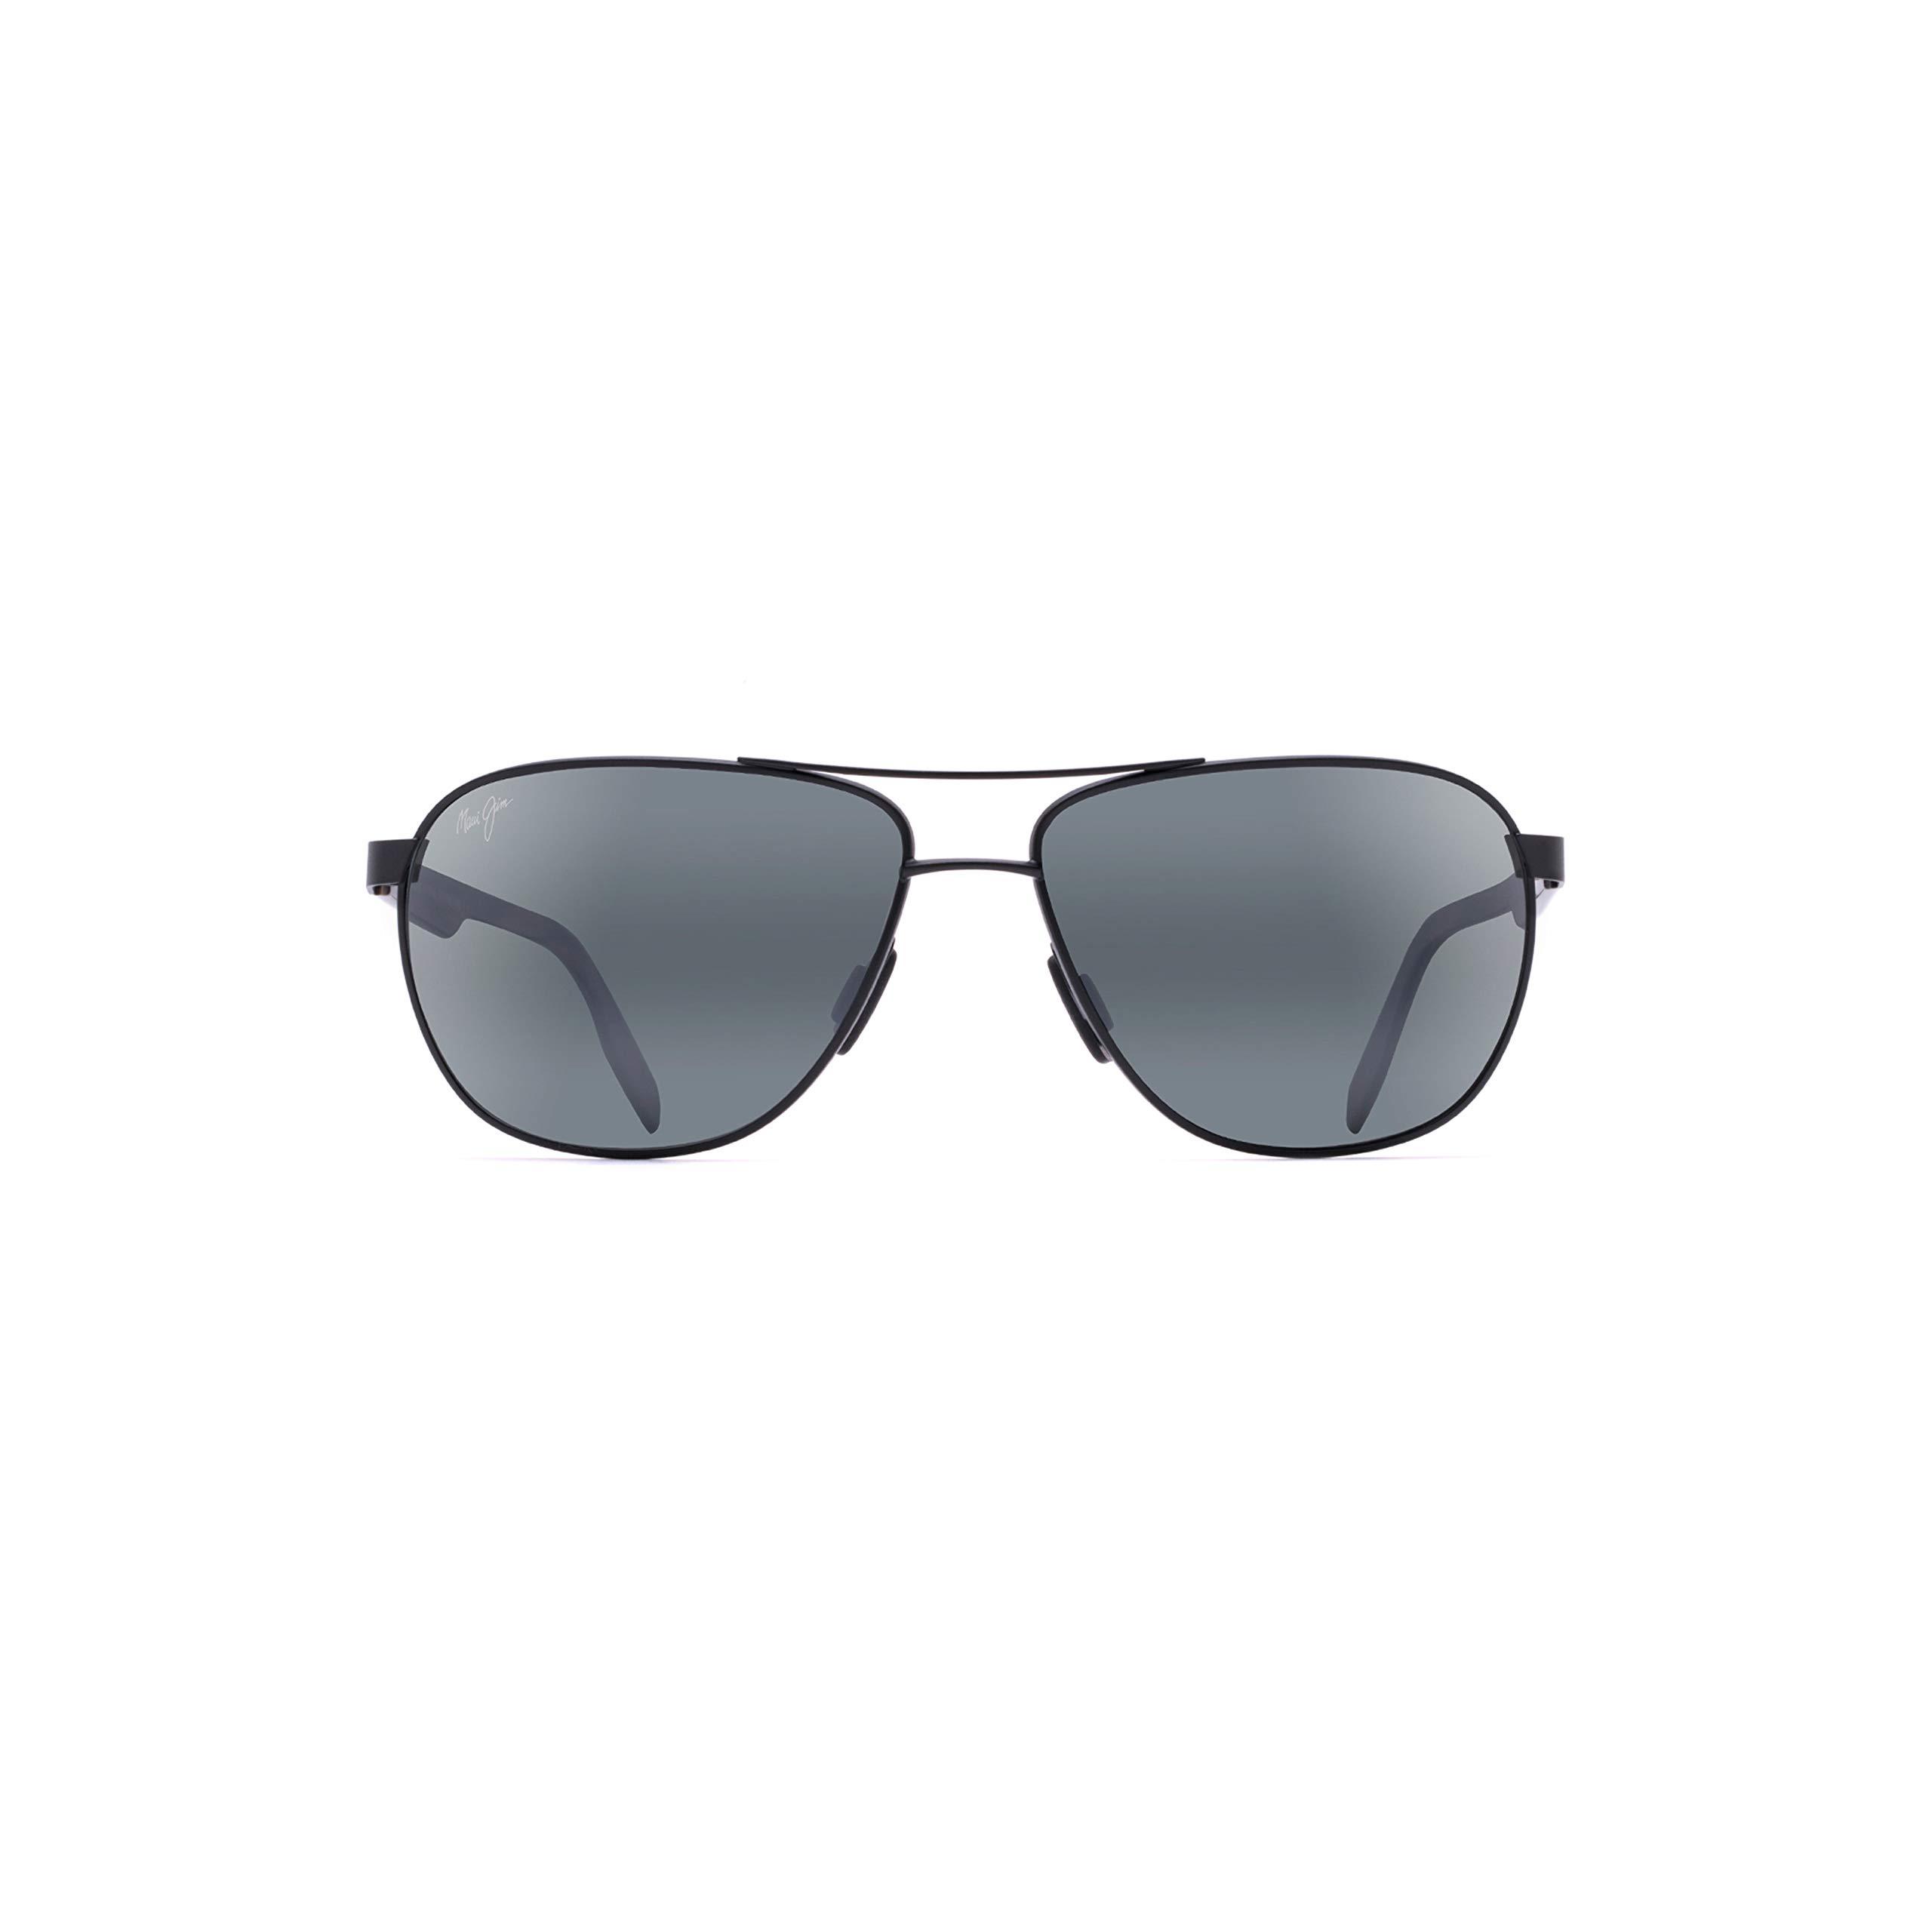 Maui Jim Sunglasses | Castles 728 | Aviator Frame, with Patented PolarizedPlus2 Lens Technology by Maui Jim